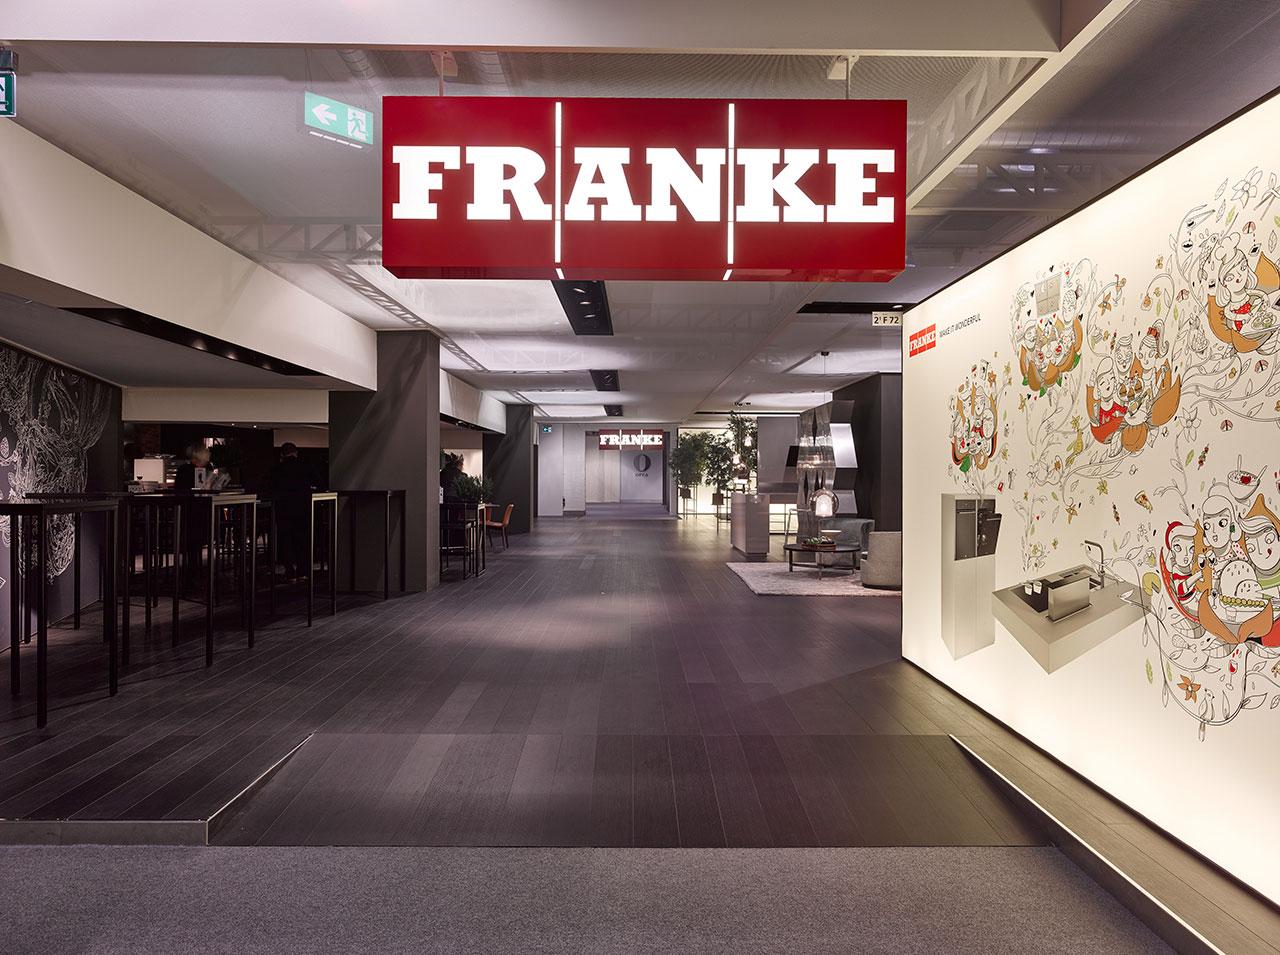 3-Franke-Swissbau-2016-Basilea